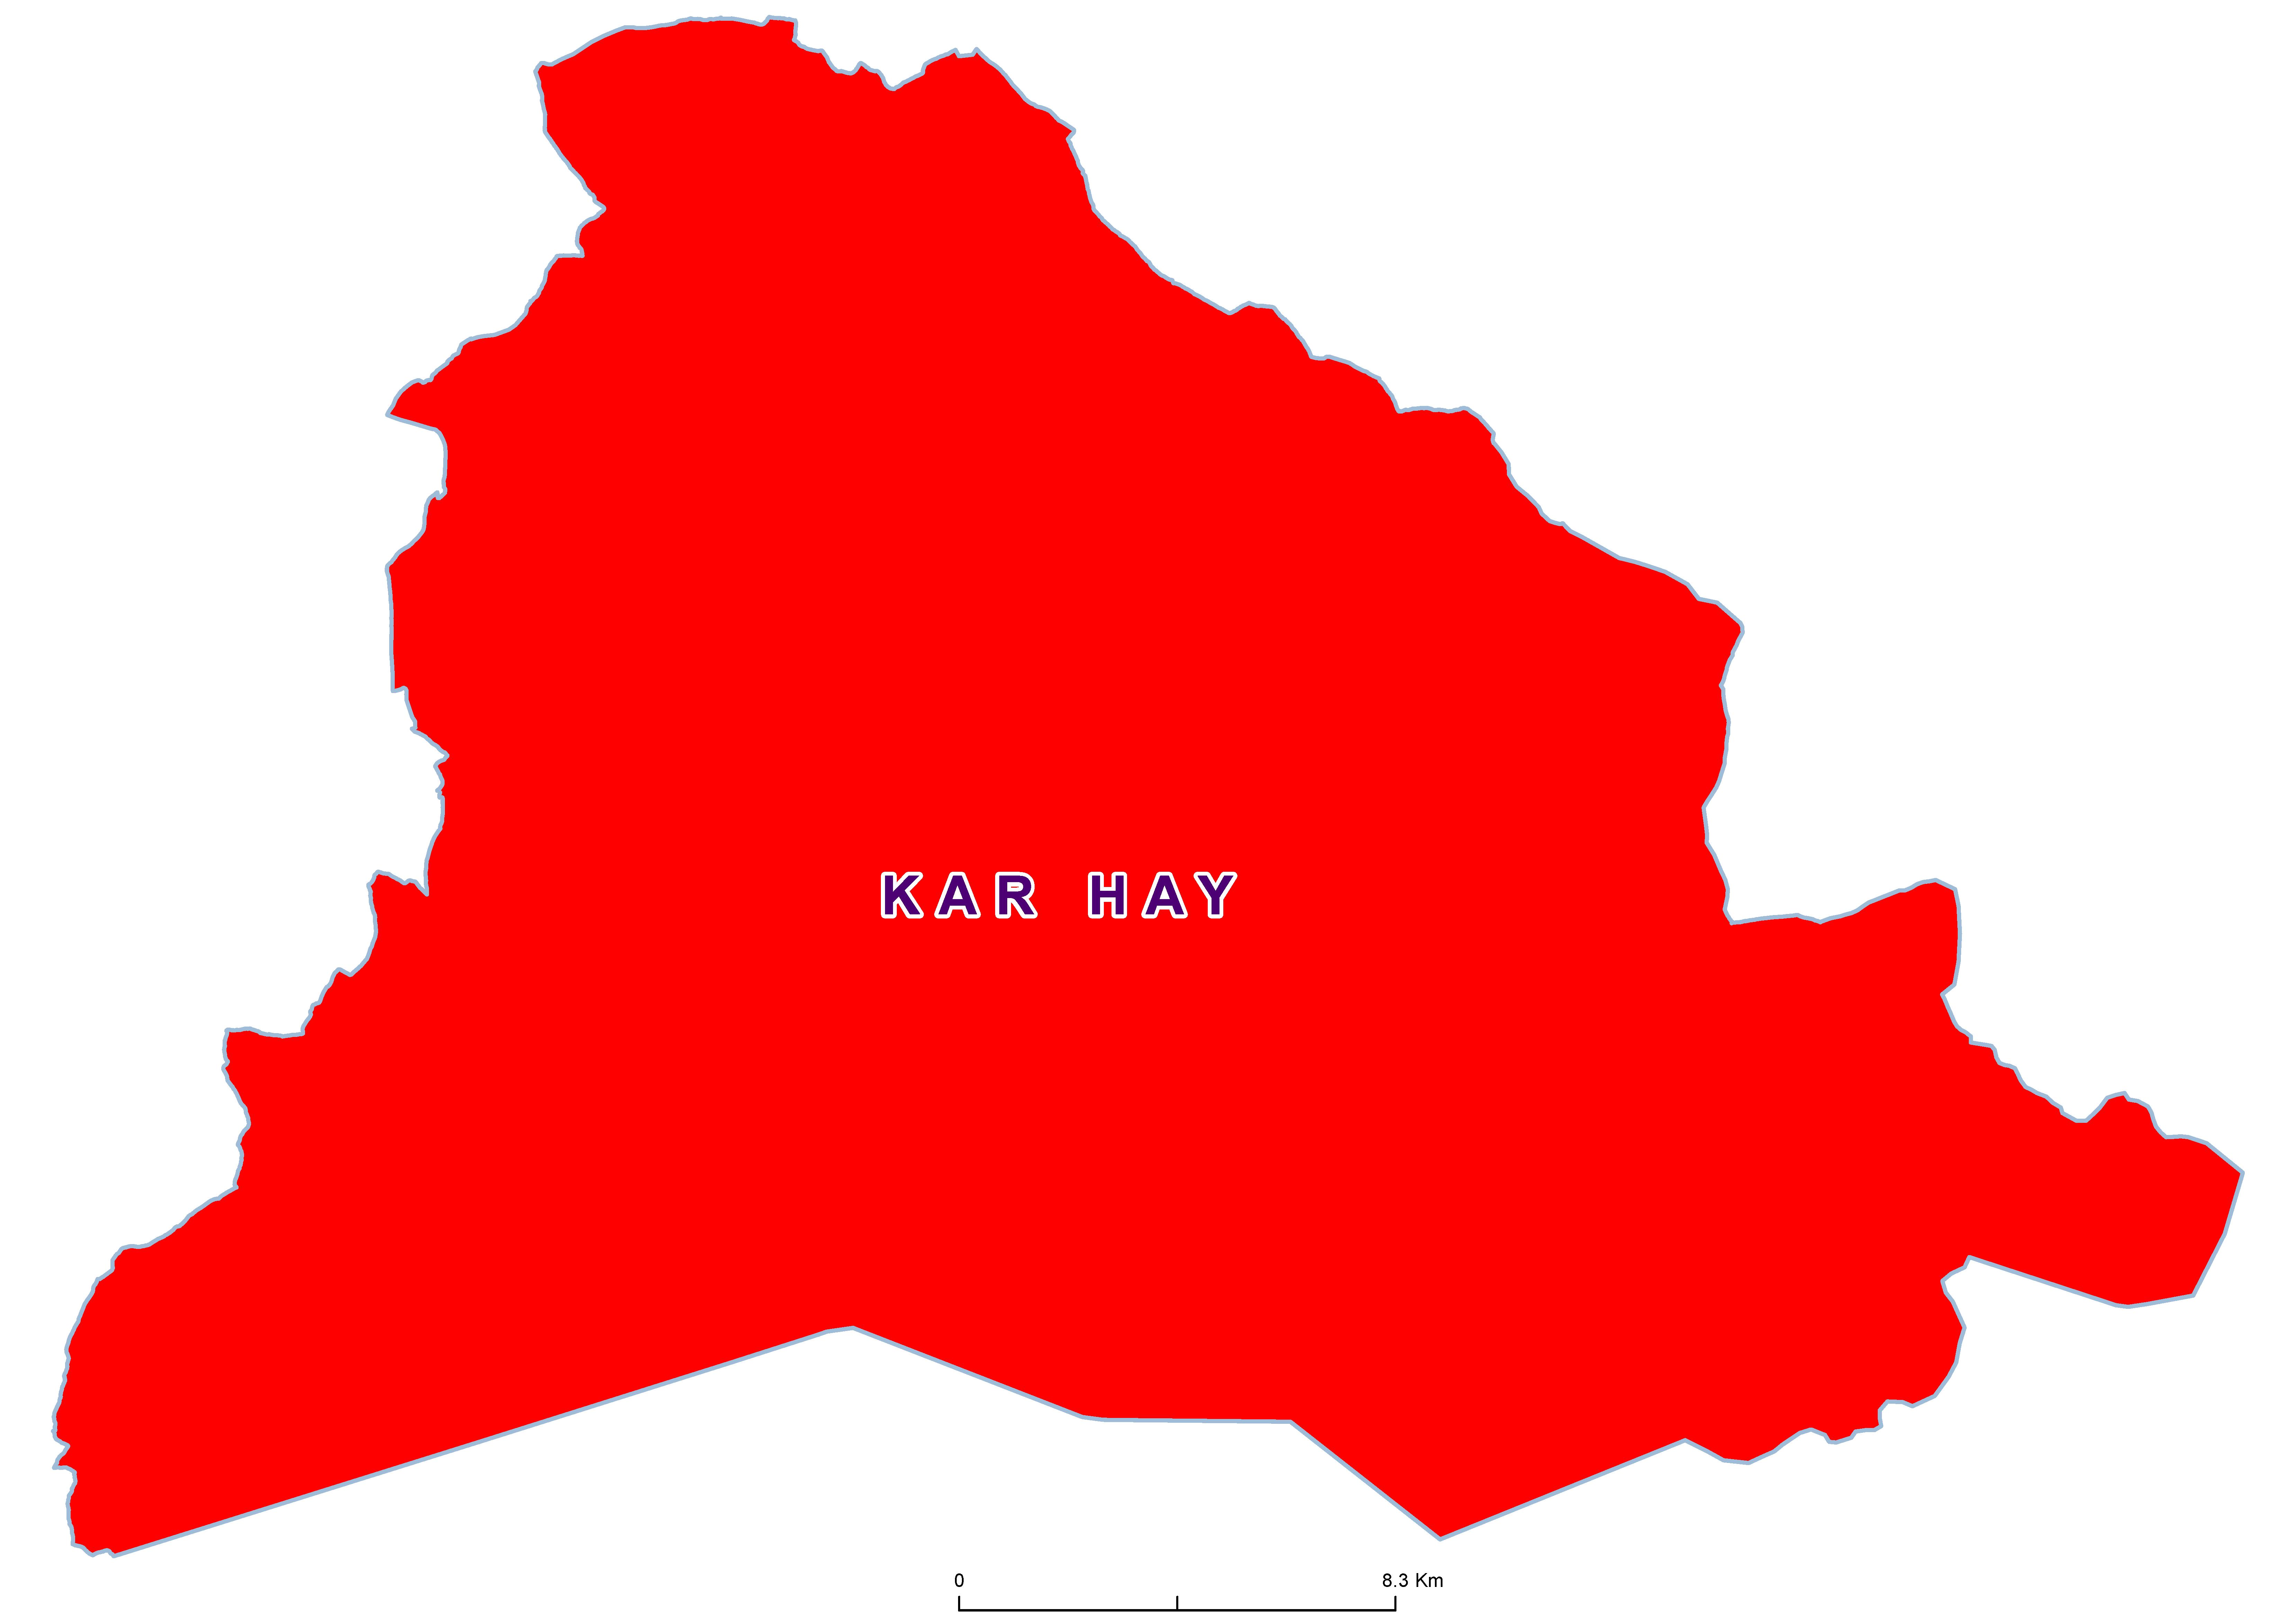 Kar Hay Mean STH 19850001